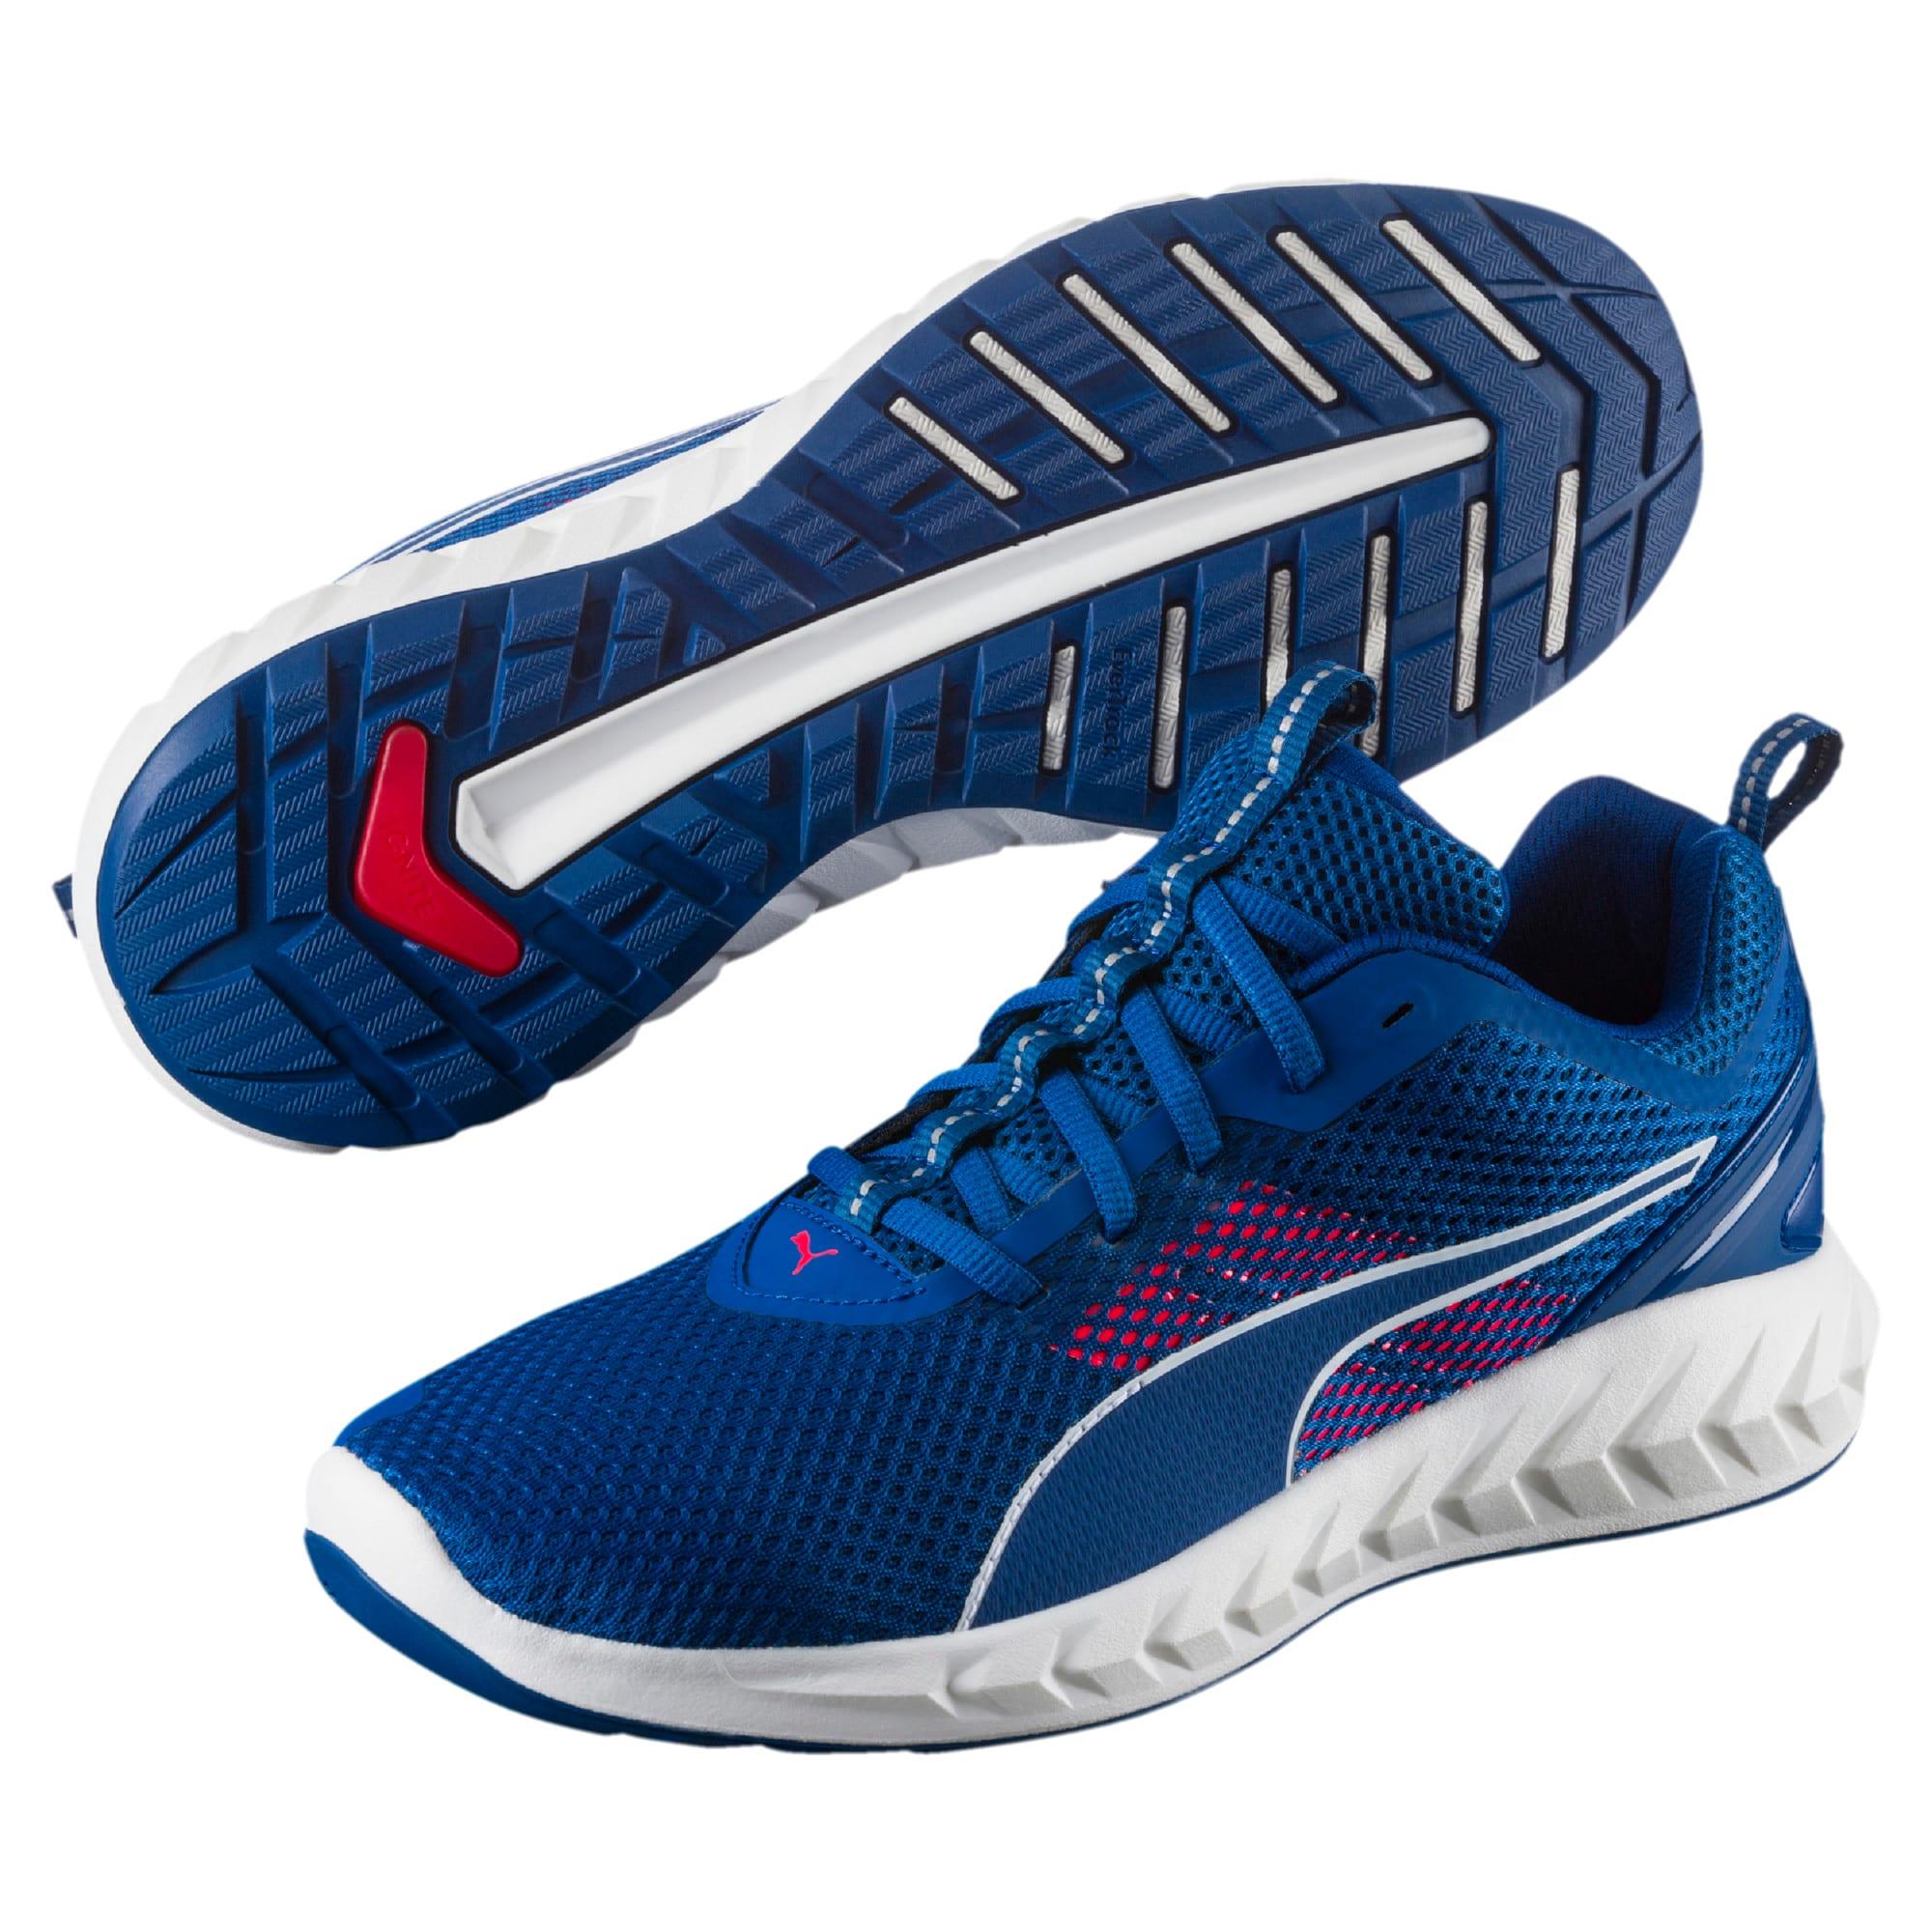 Thumbnail 2 of IGNITE Ultimate 2 Men's Running Shoes, TRUE BLUE-Bright Plasma, medium-IND